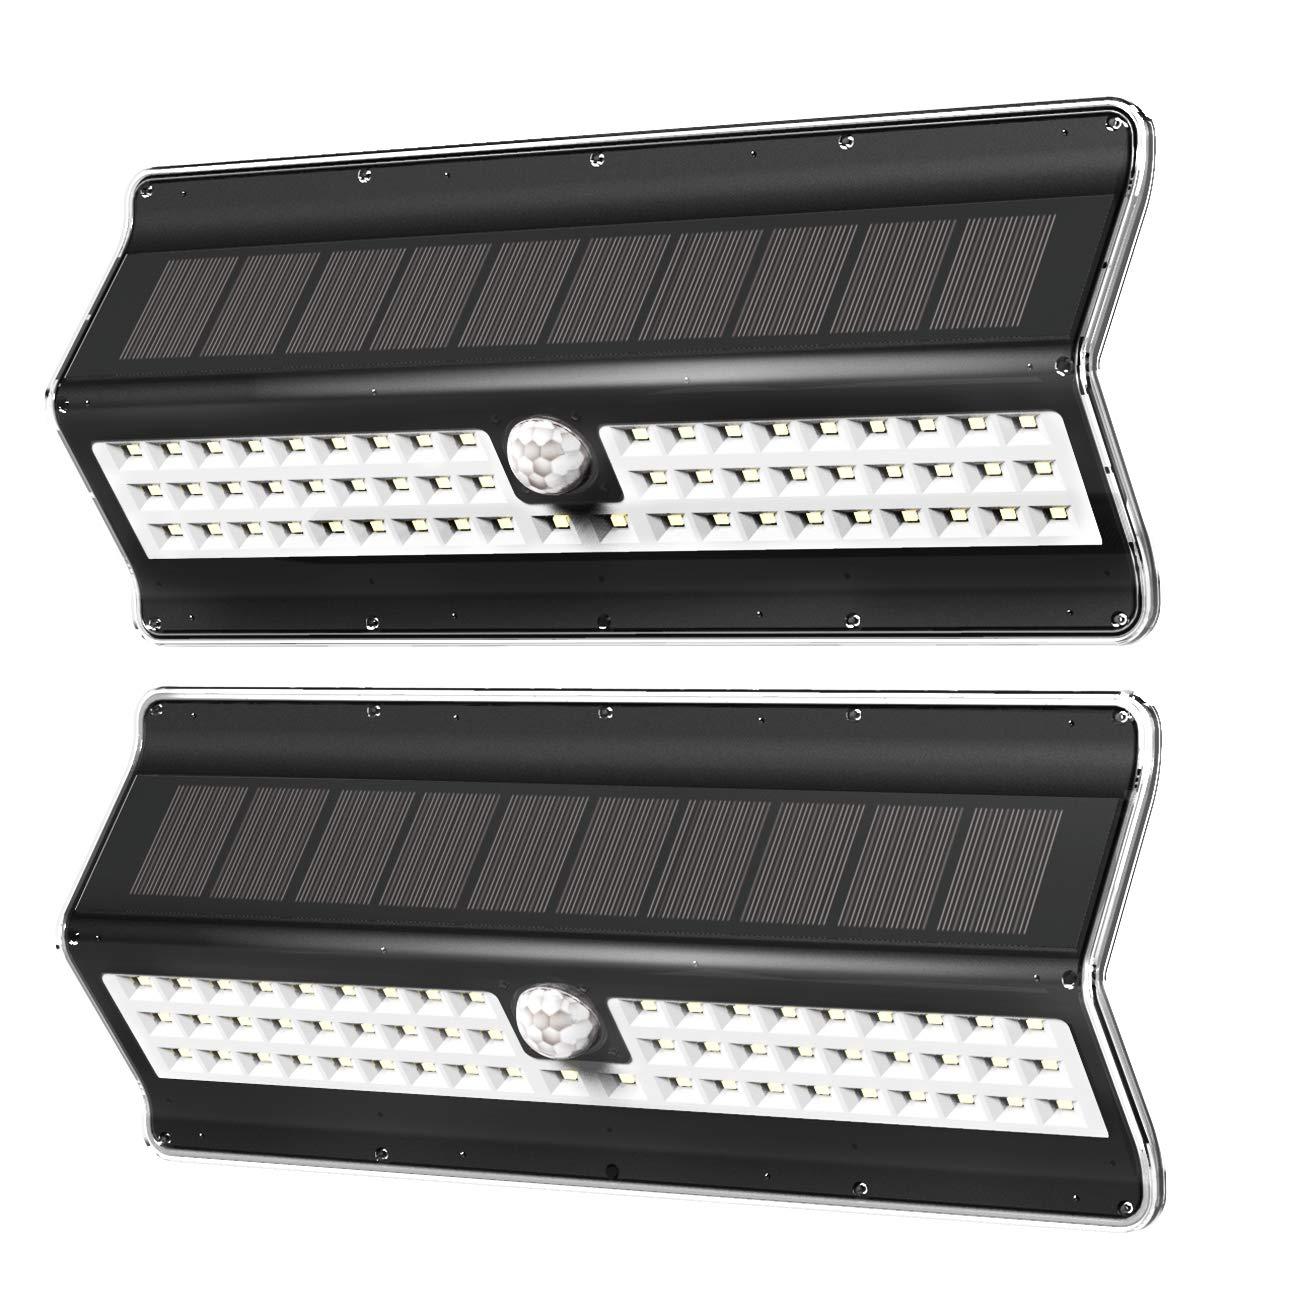 EZBASICS Solar Lights Outdoor 56 LED, Solar Motion Sensor Light Outdoor, Waterproof Wall Light, Wireless Security Night Light, Black Shape, 2 Pack by EZBASICS